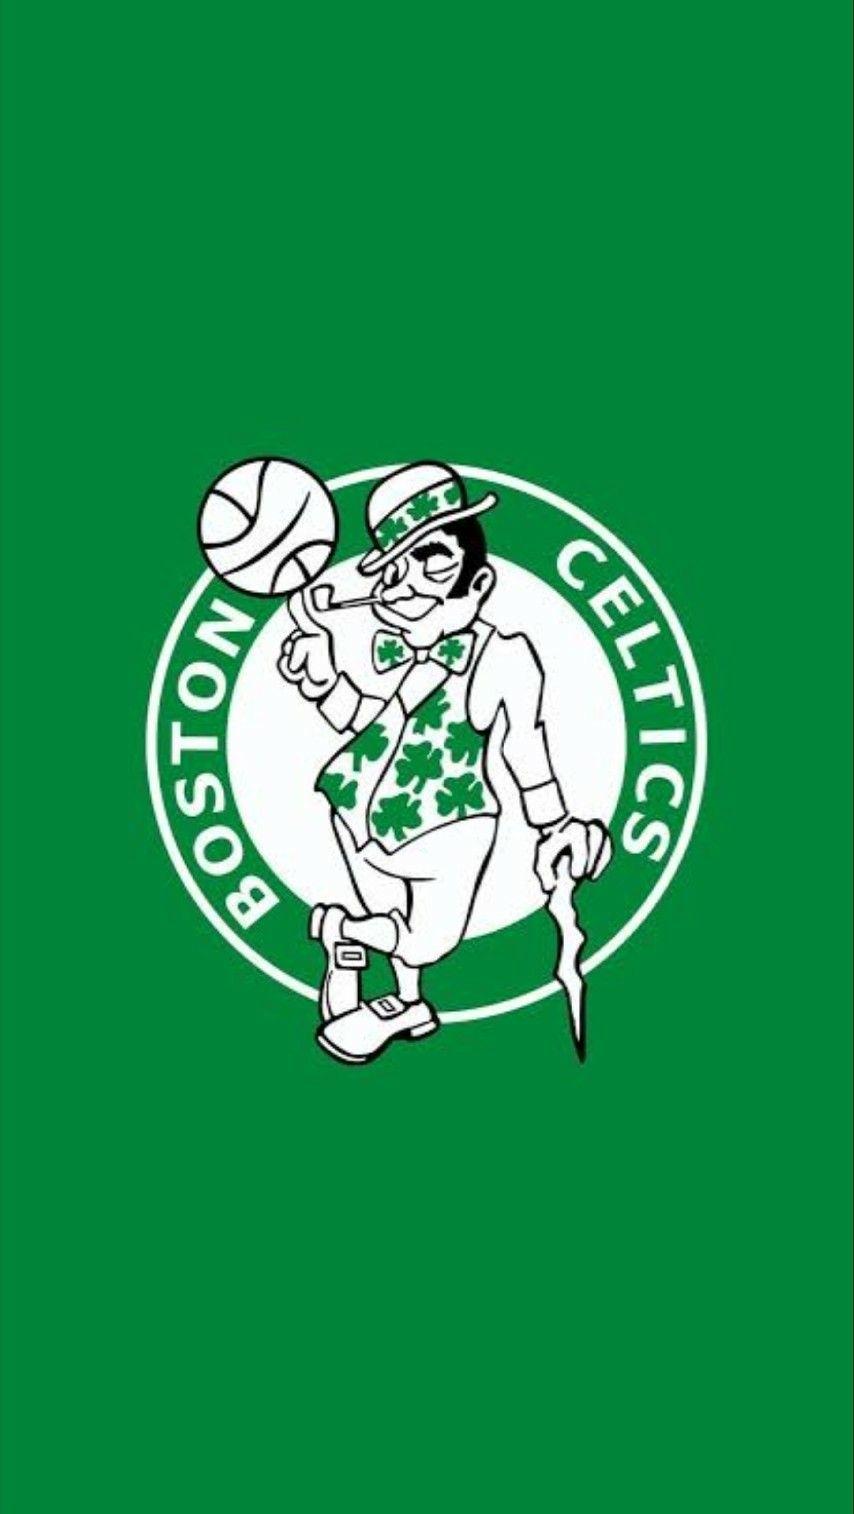 Boston Celtics Celtics Wallpaper Boston Celtics Wallpaper Boston Celtics Wallpapers